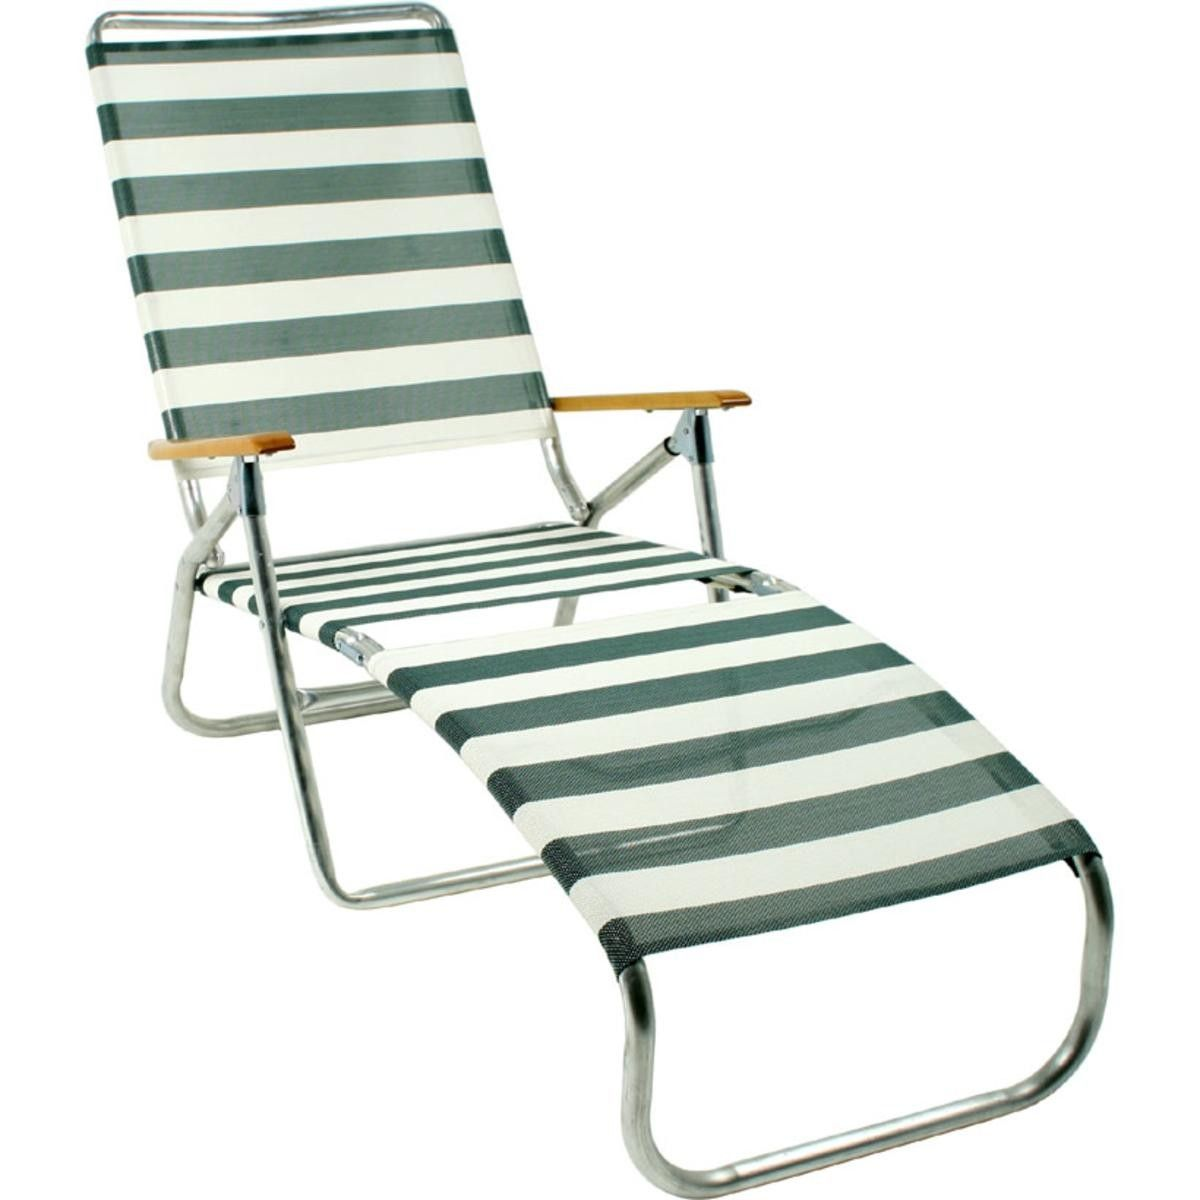 Folding Lounge Chair Chaise